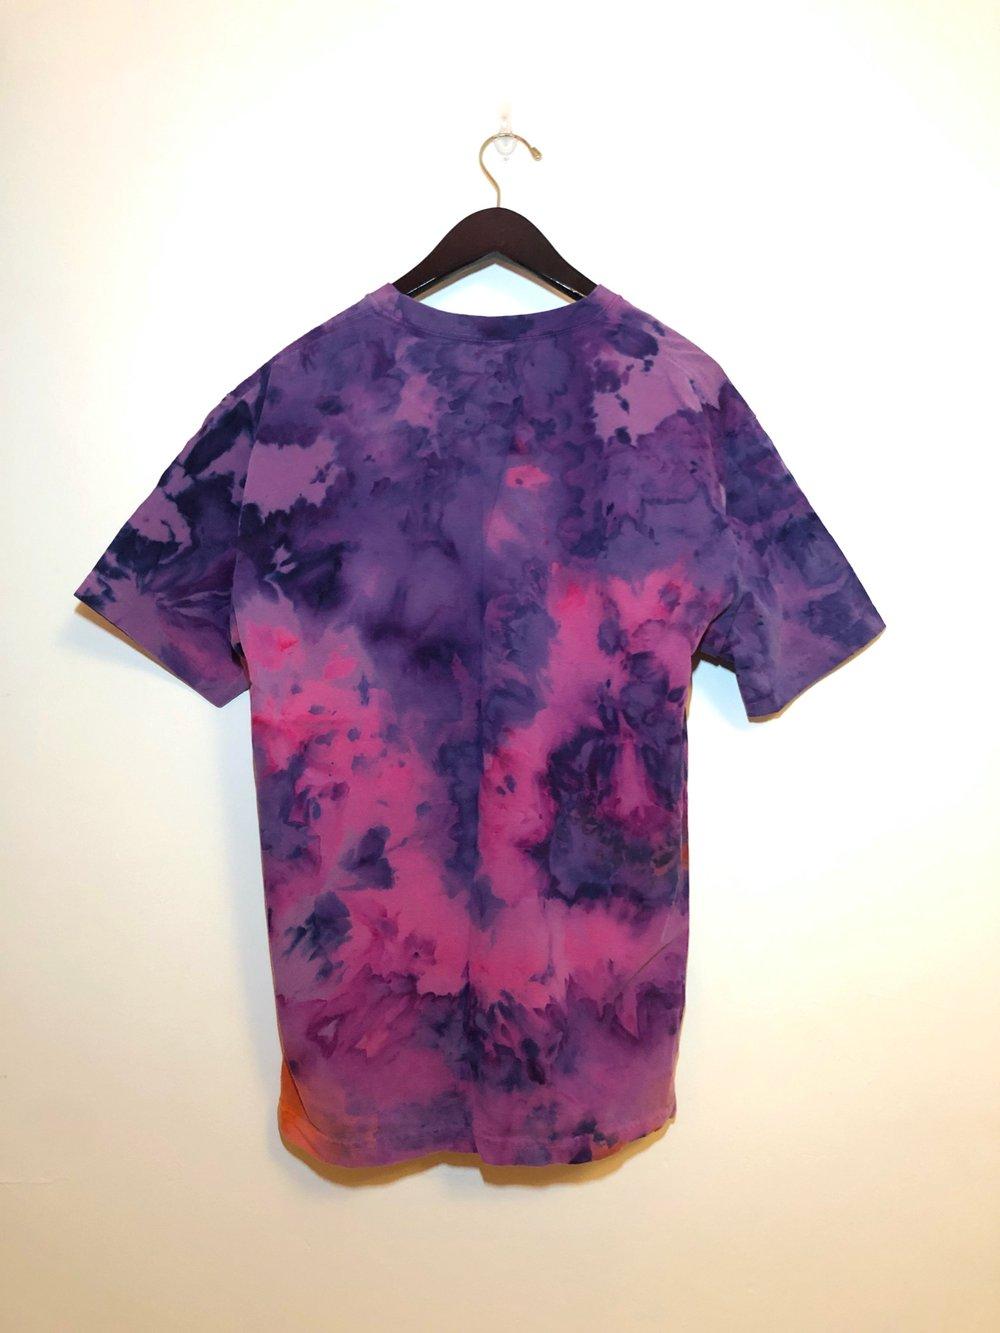 Shirt #27 - Medium